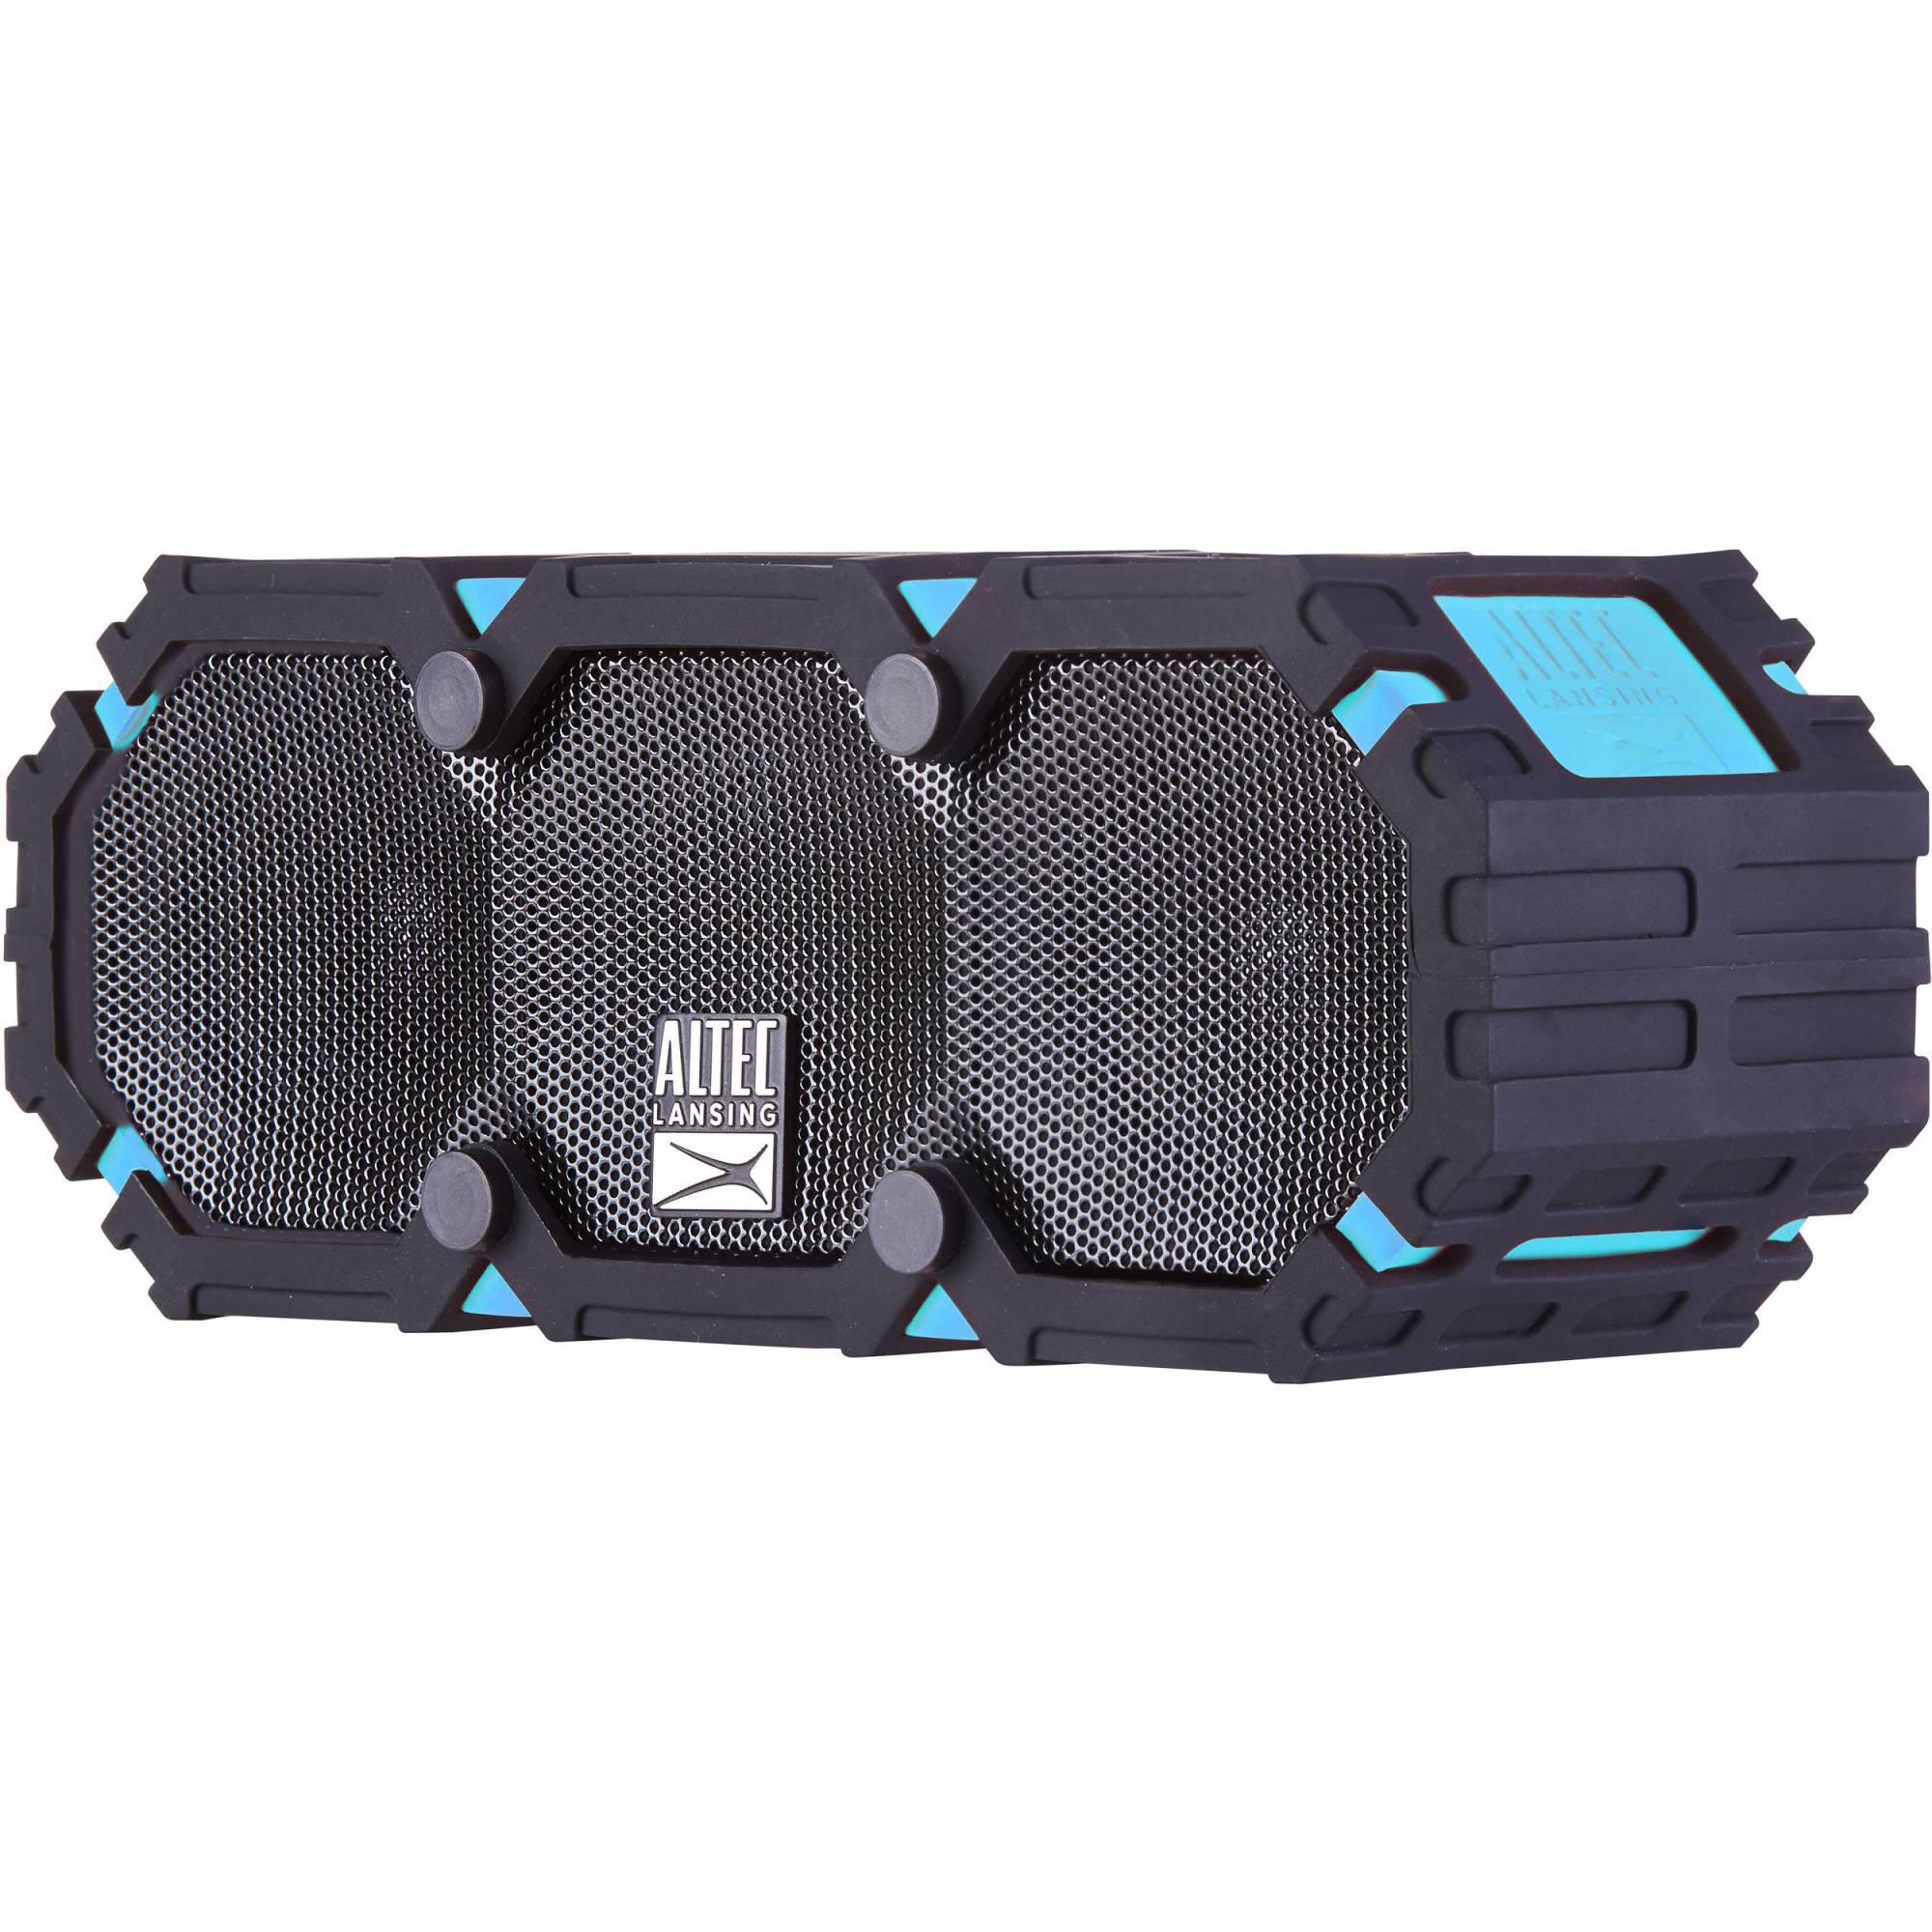 hight resolution of altec lansing mini lifejacket 3s bluetooth wireless speaker aqua blue